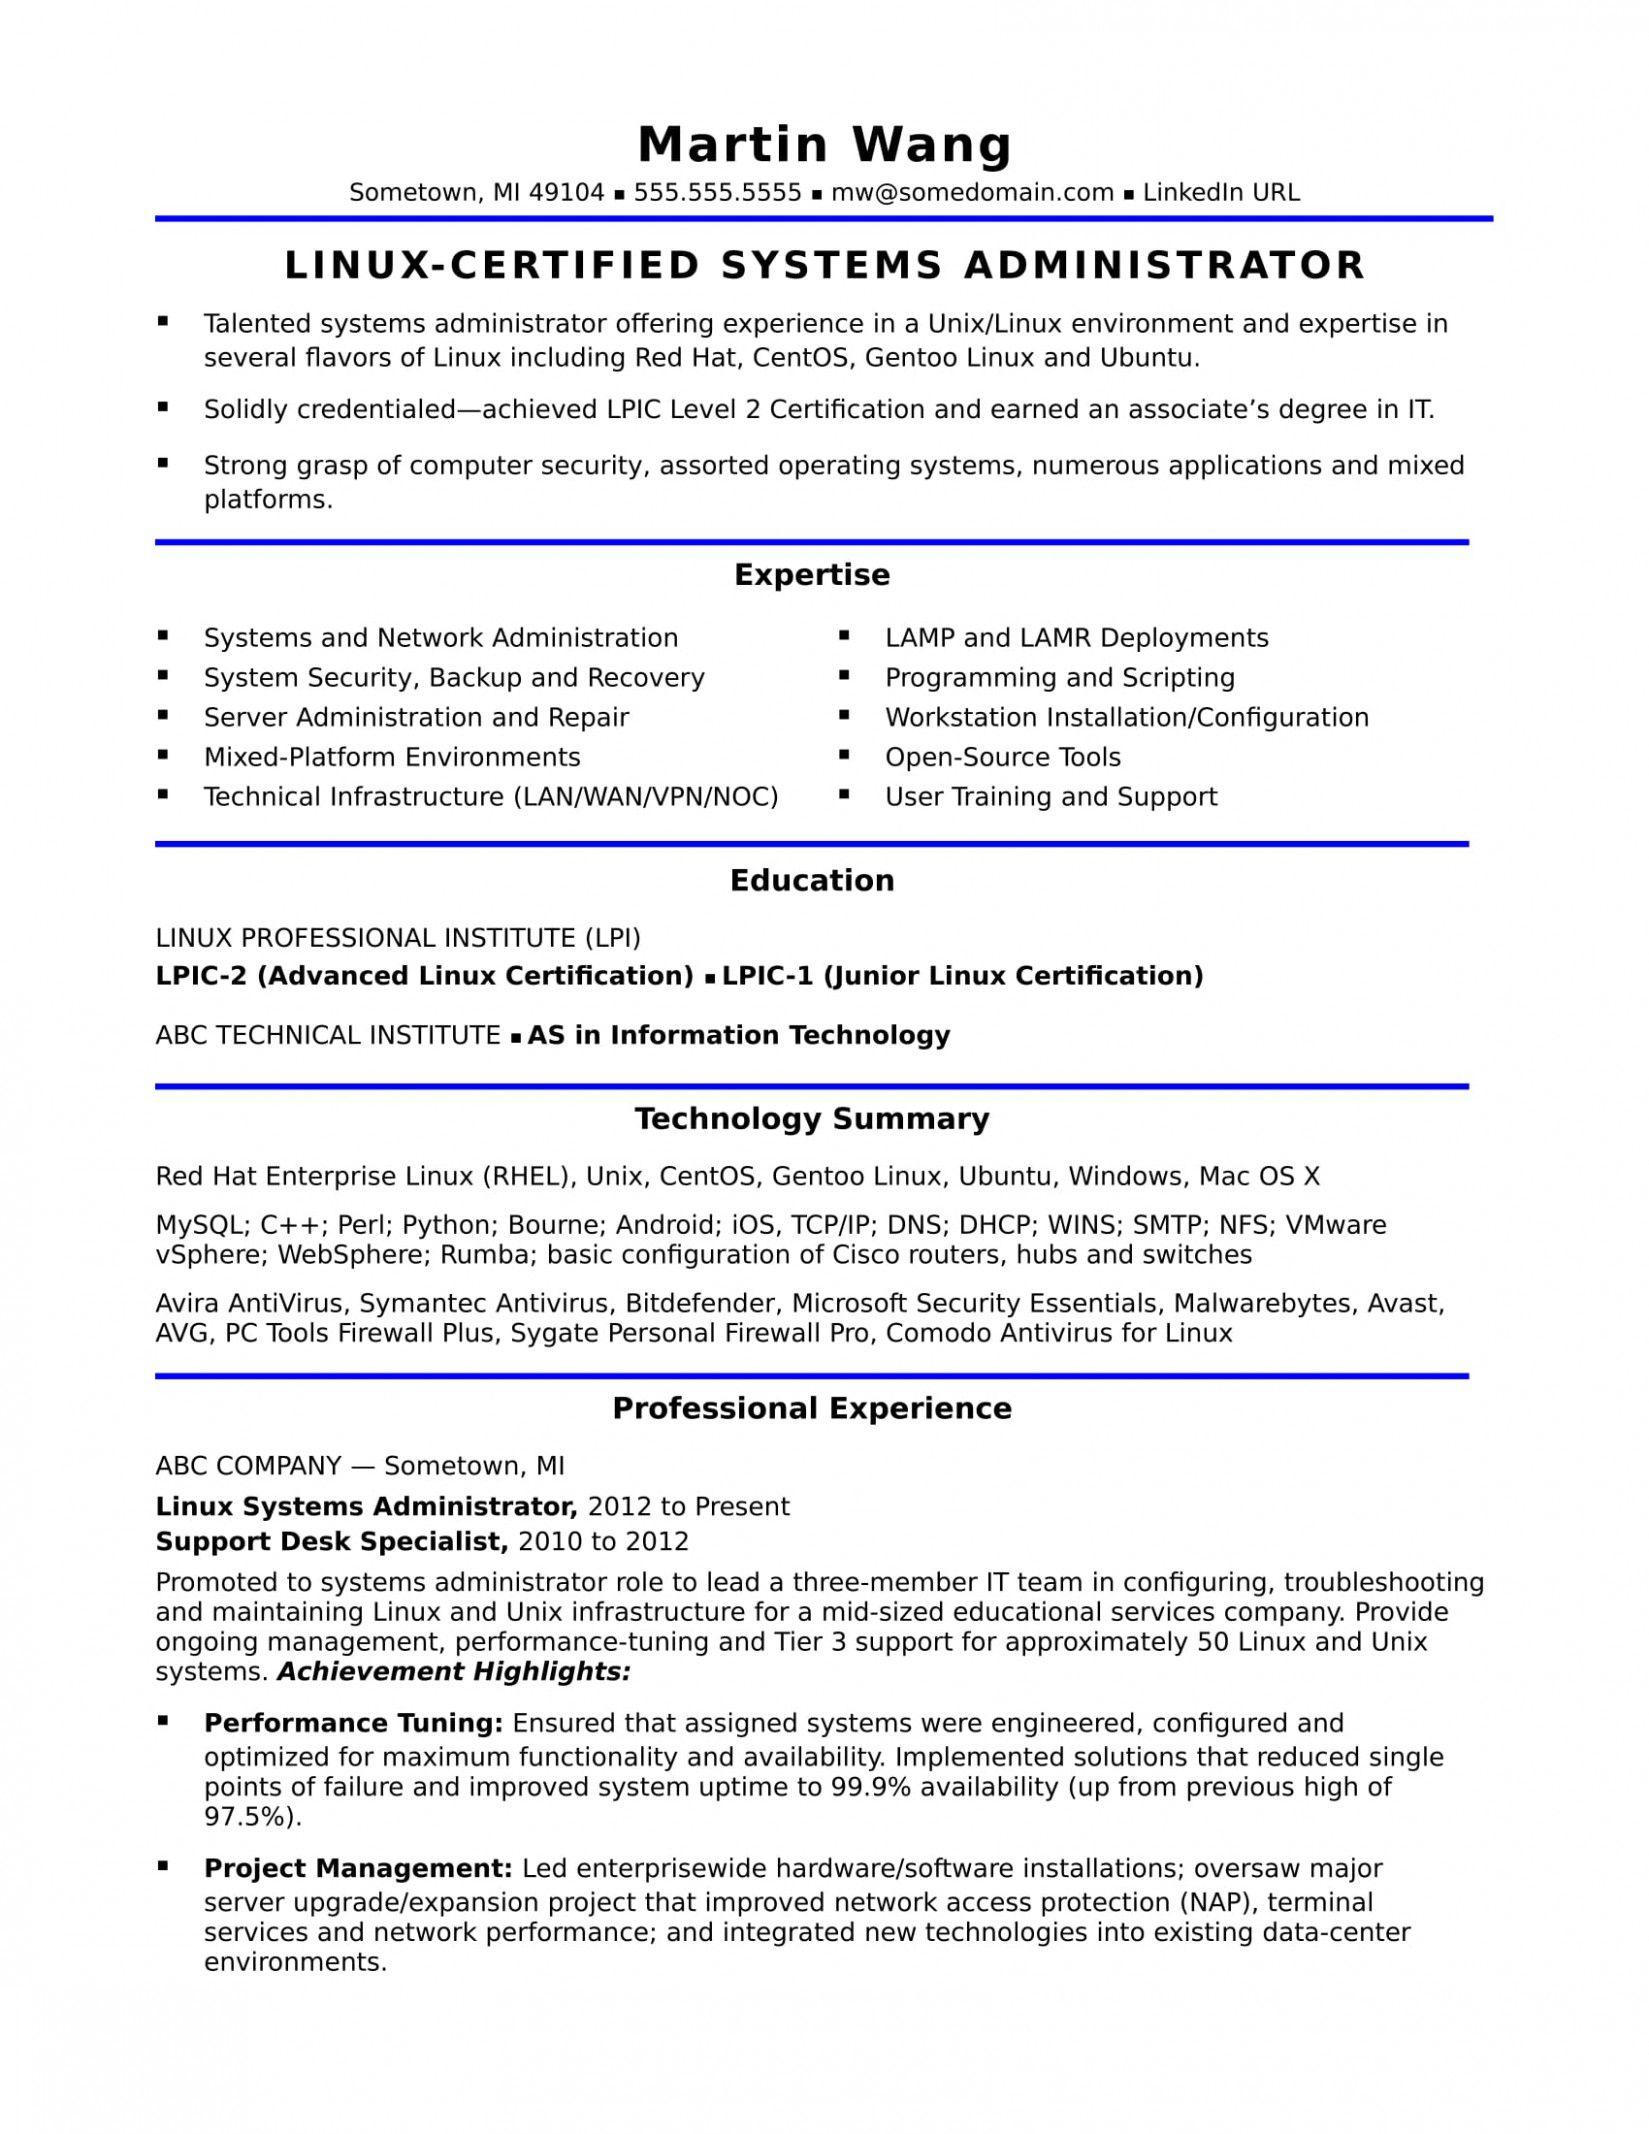 14 Hardware And Networking Brisker Resume Format Doc Basic Resume Resume Examples Resume